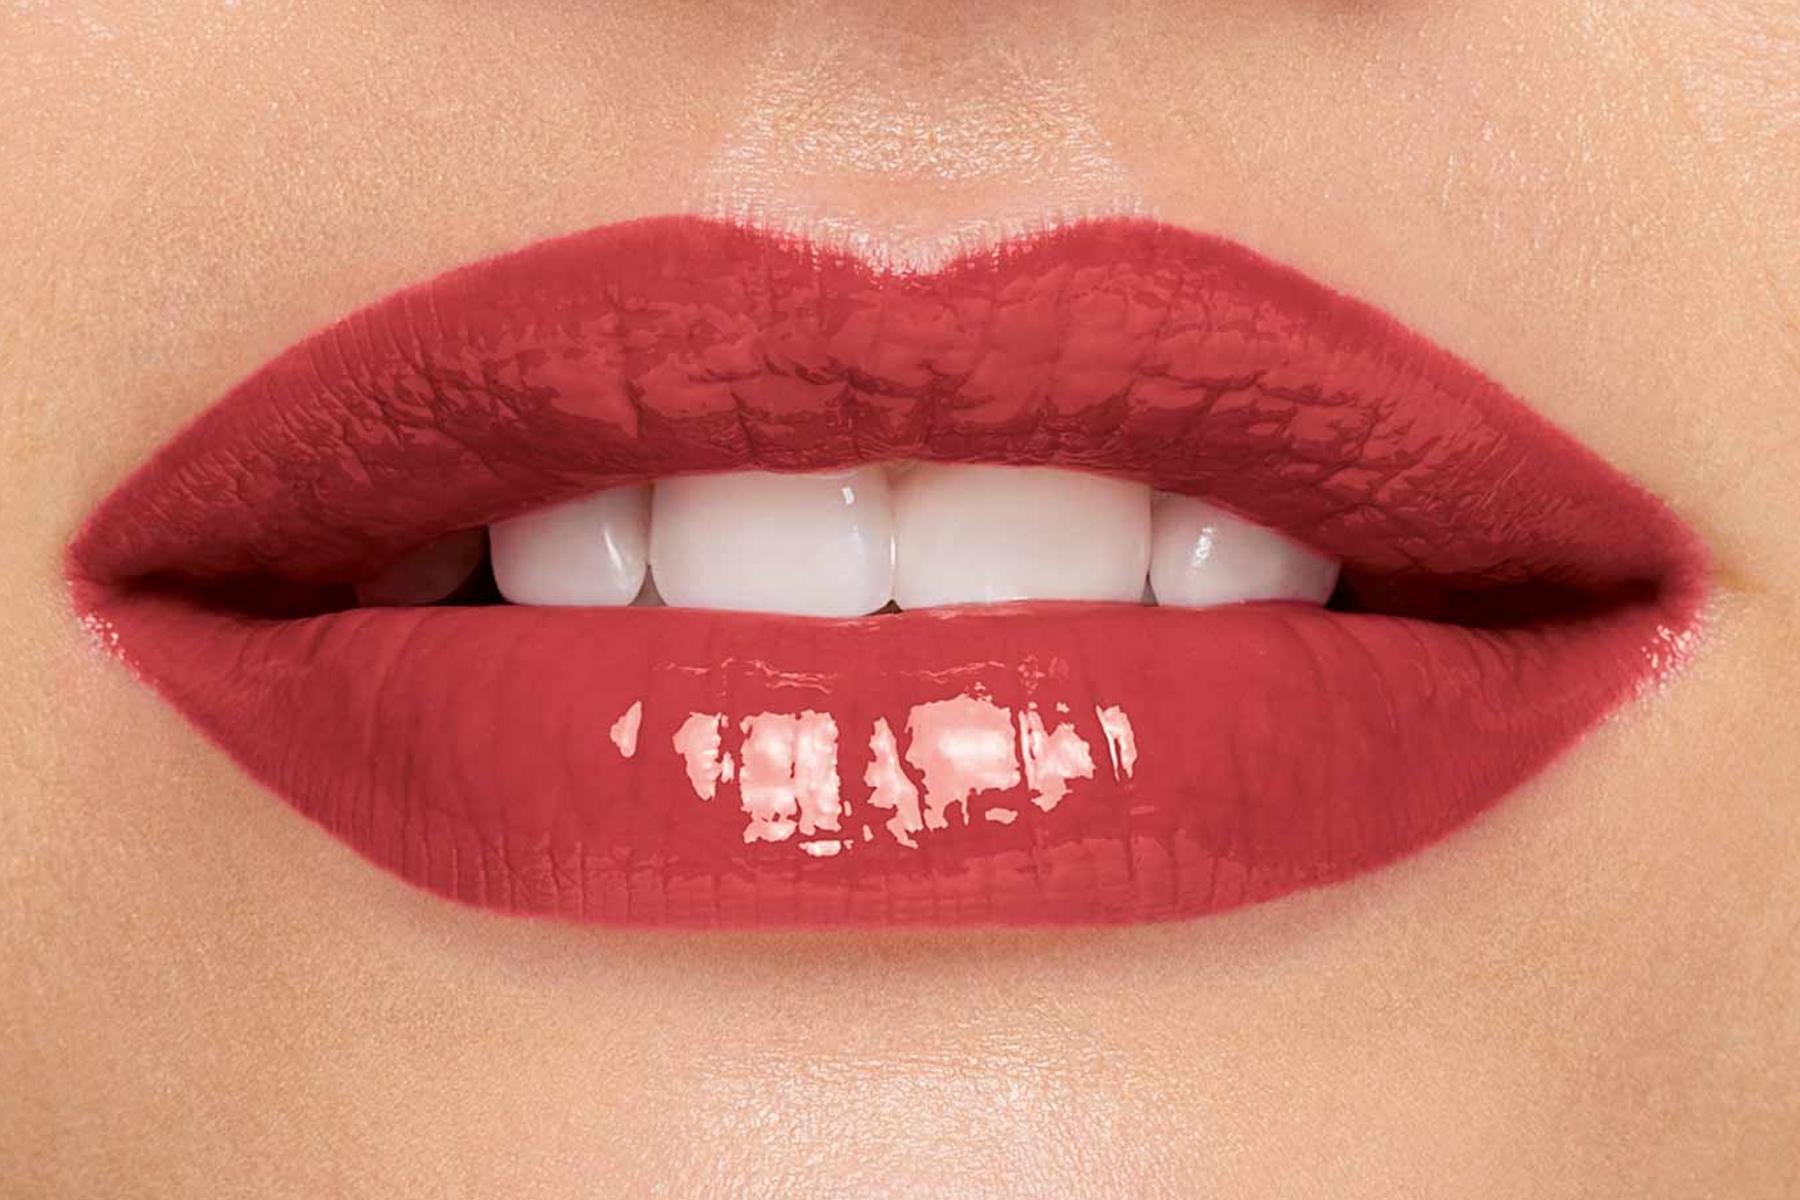 Clarins-lip-comfort-oil-intense-swatch-intense-rosewood